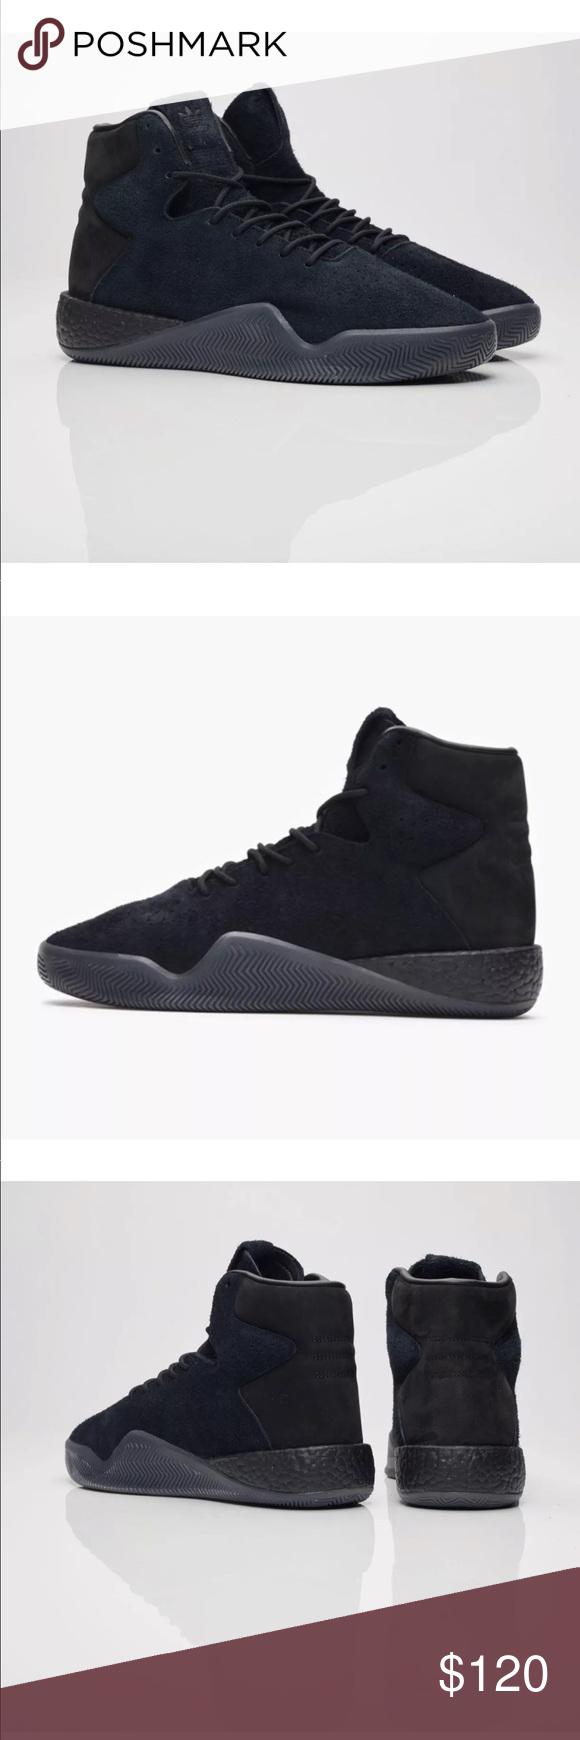 best website 0ef2a 18f2a Adidas Tubular Instinct Boost High Top Sneakers Adidas ...